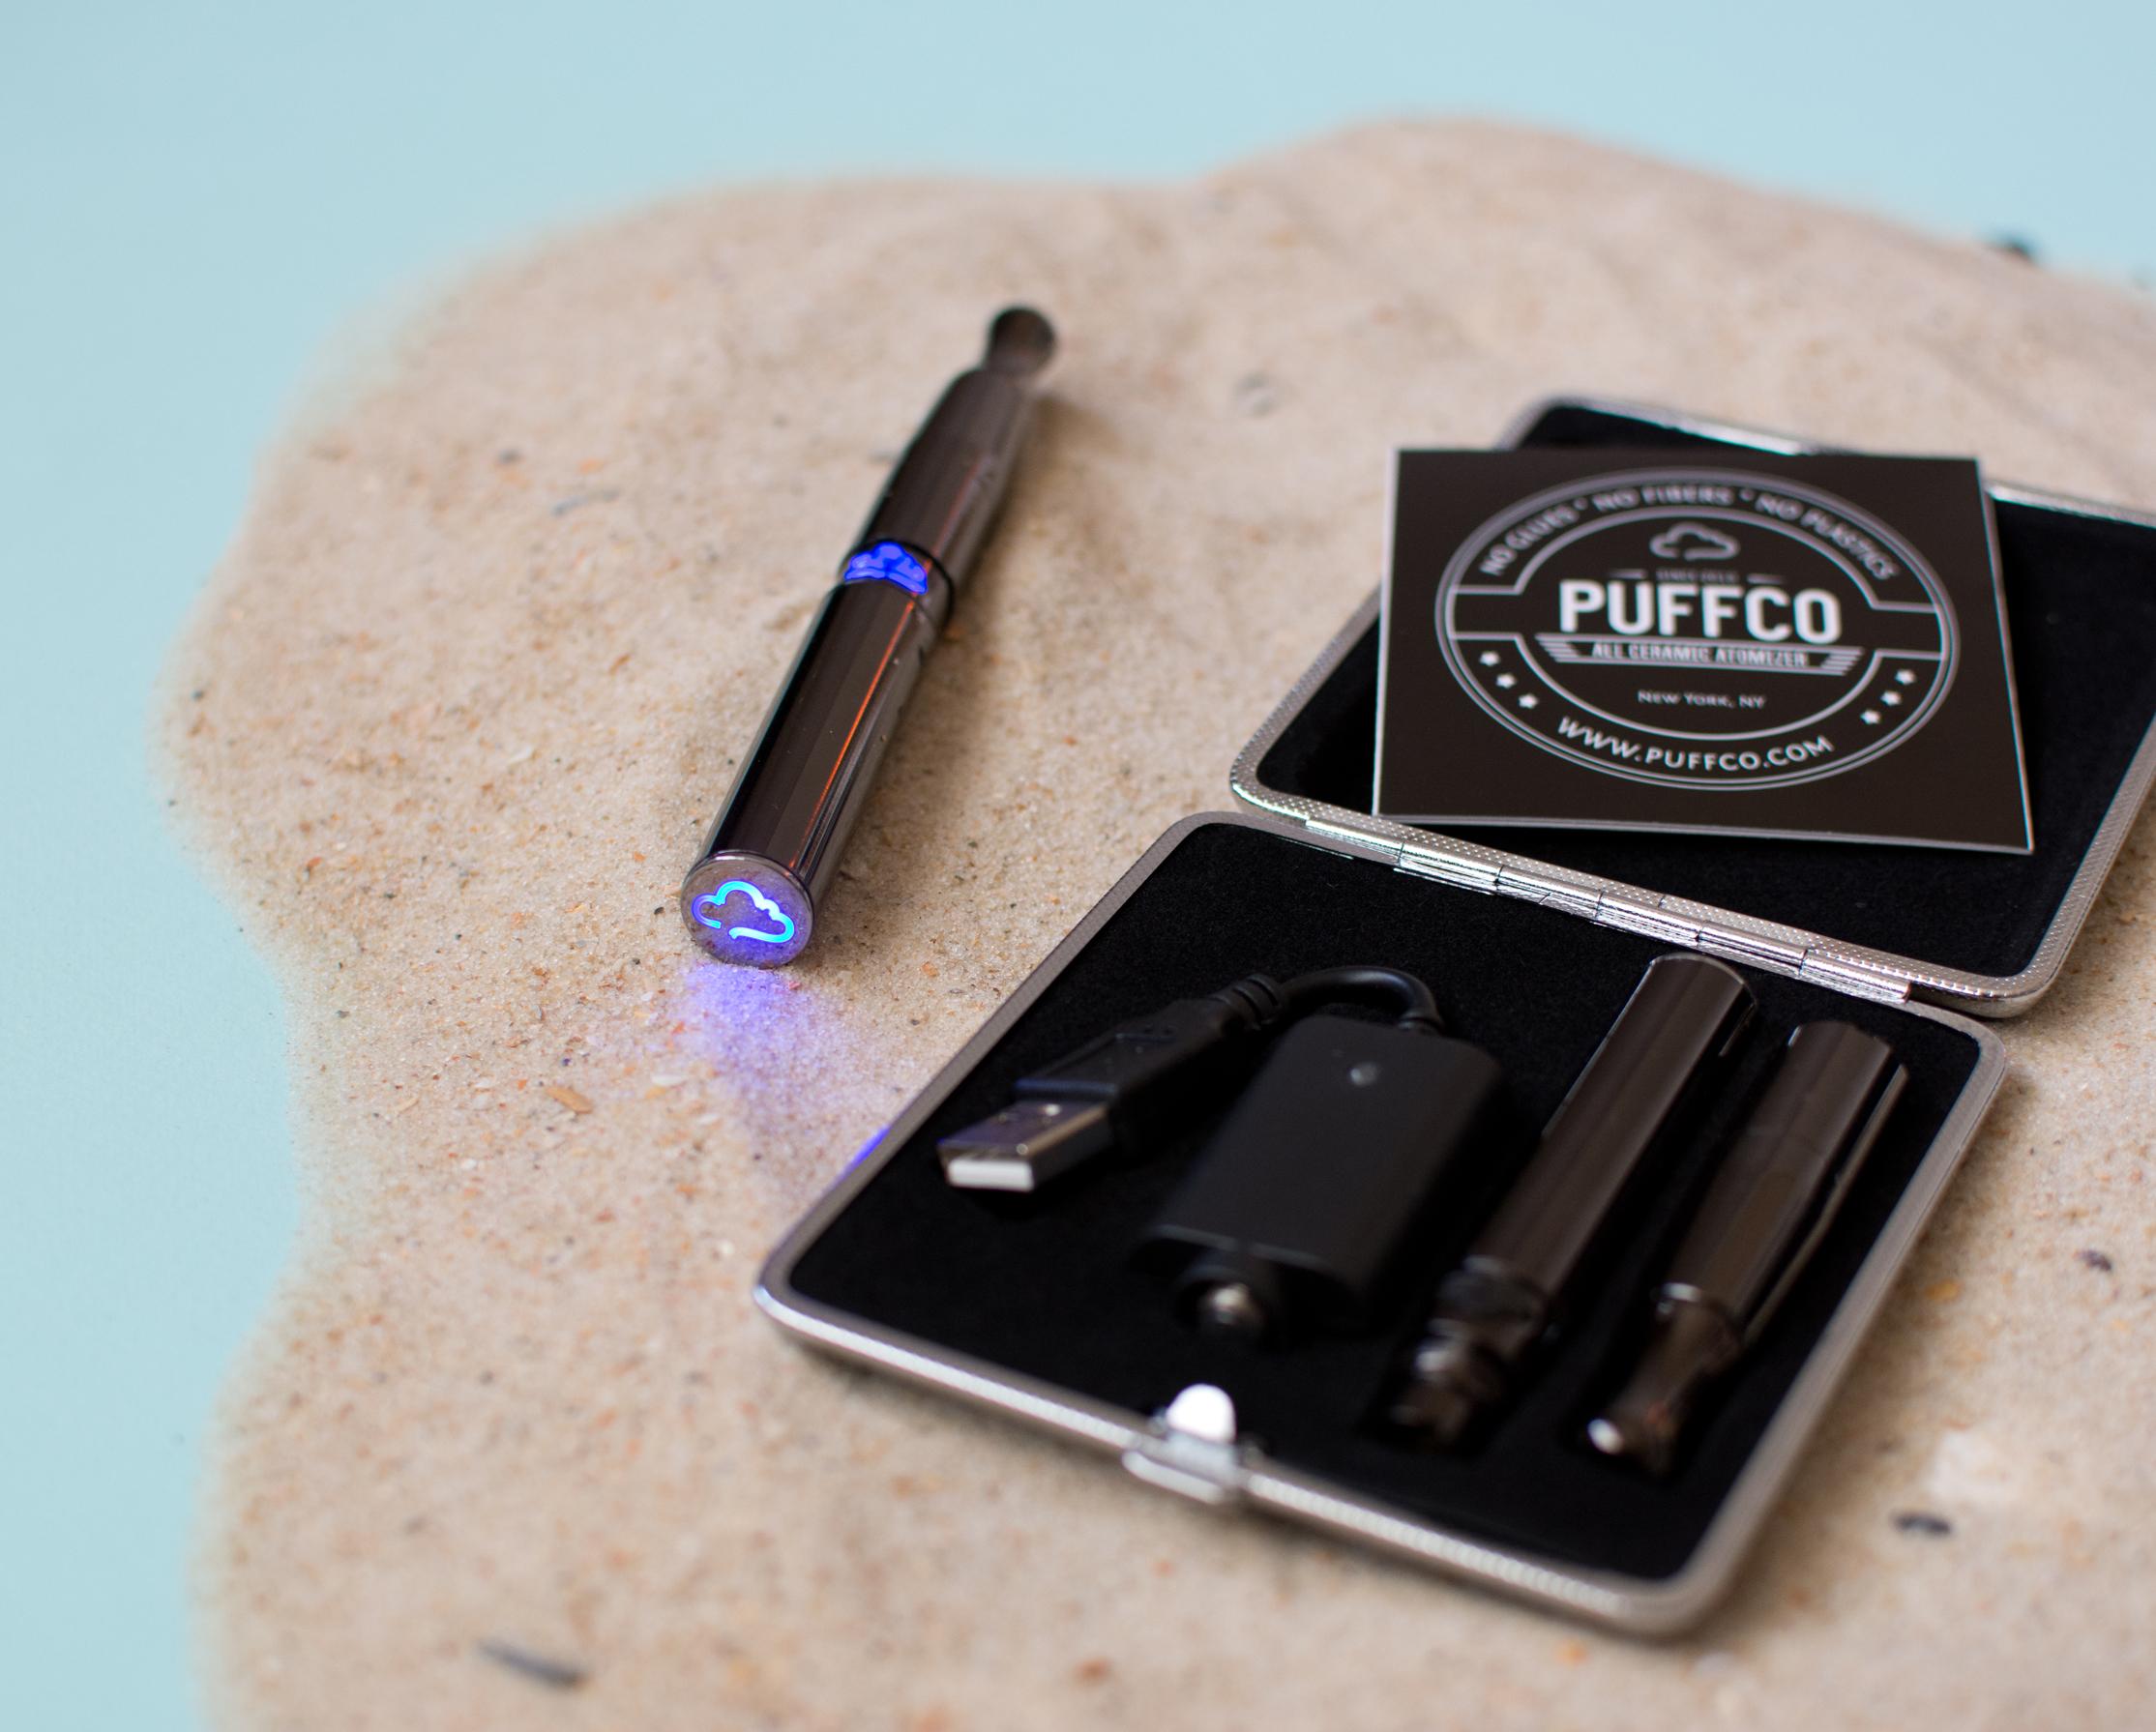 puffco-sand.jpg